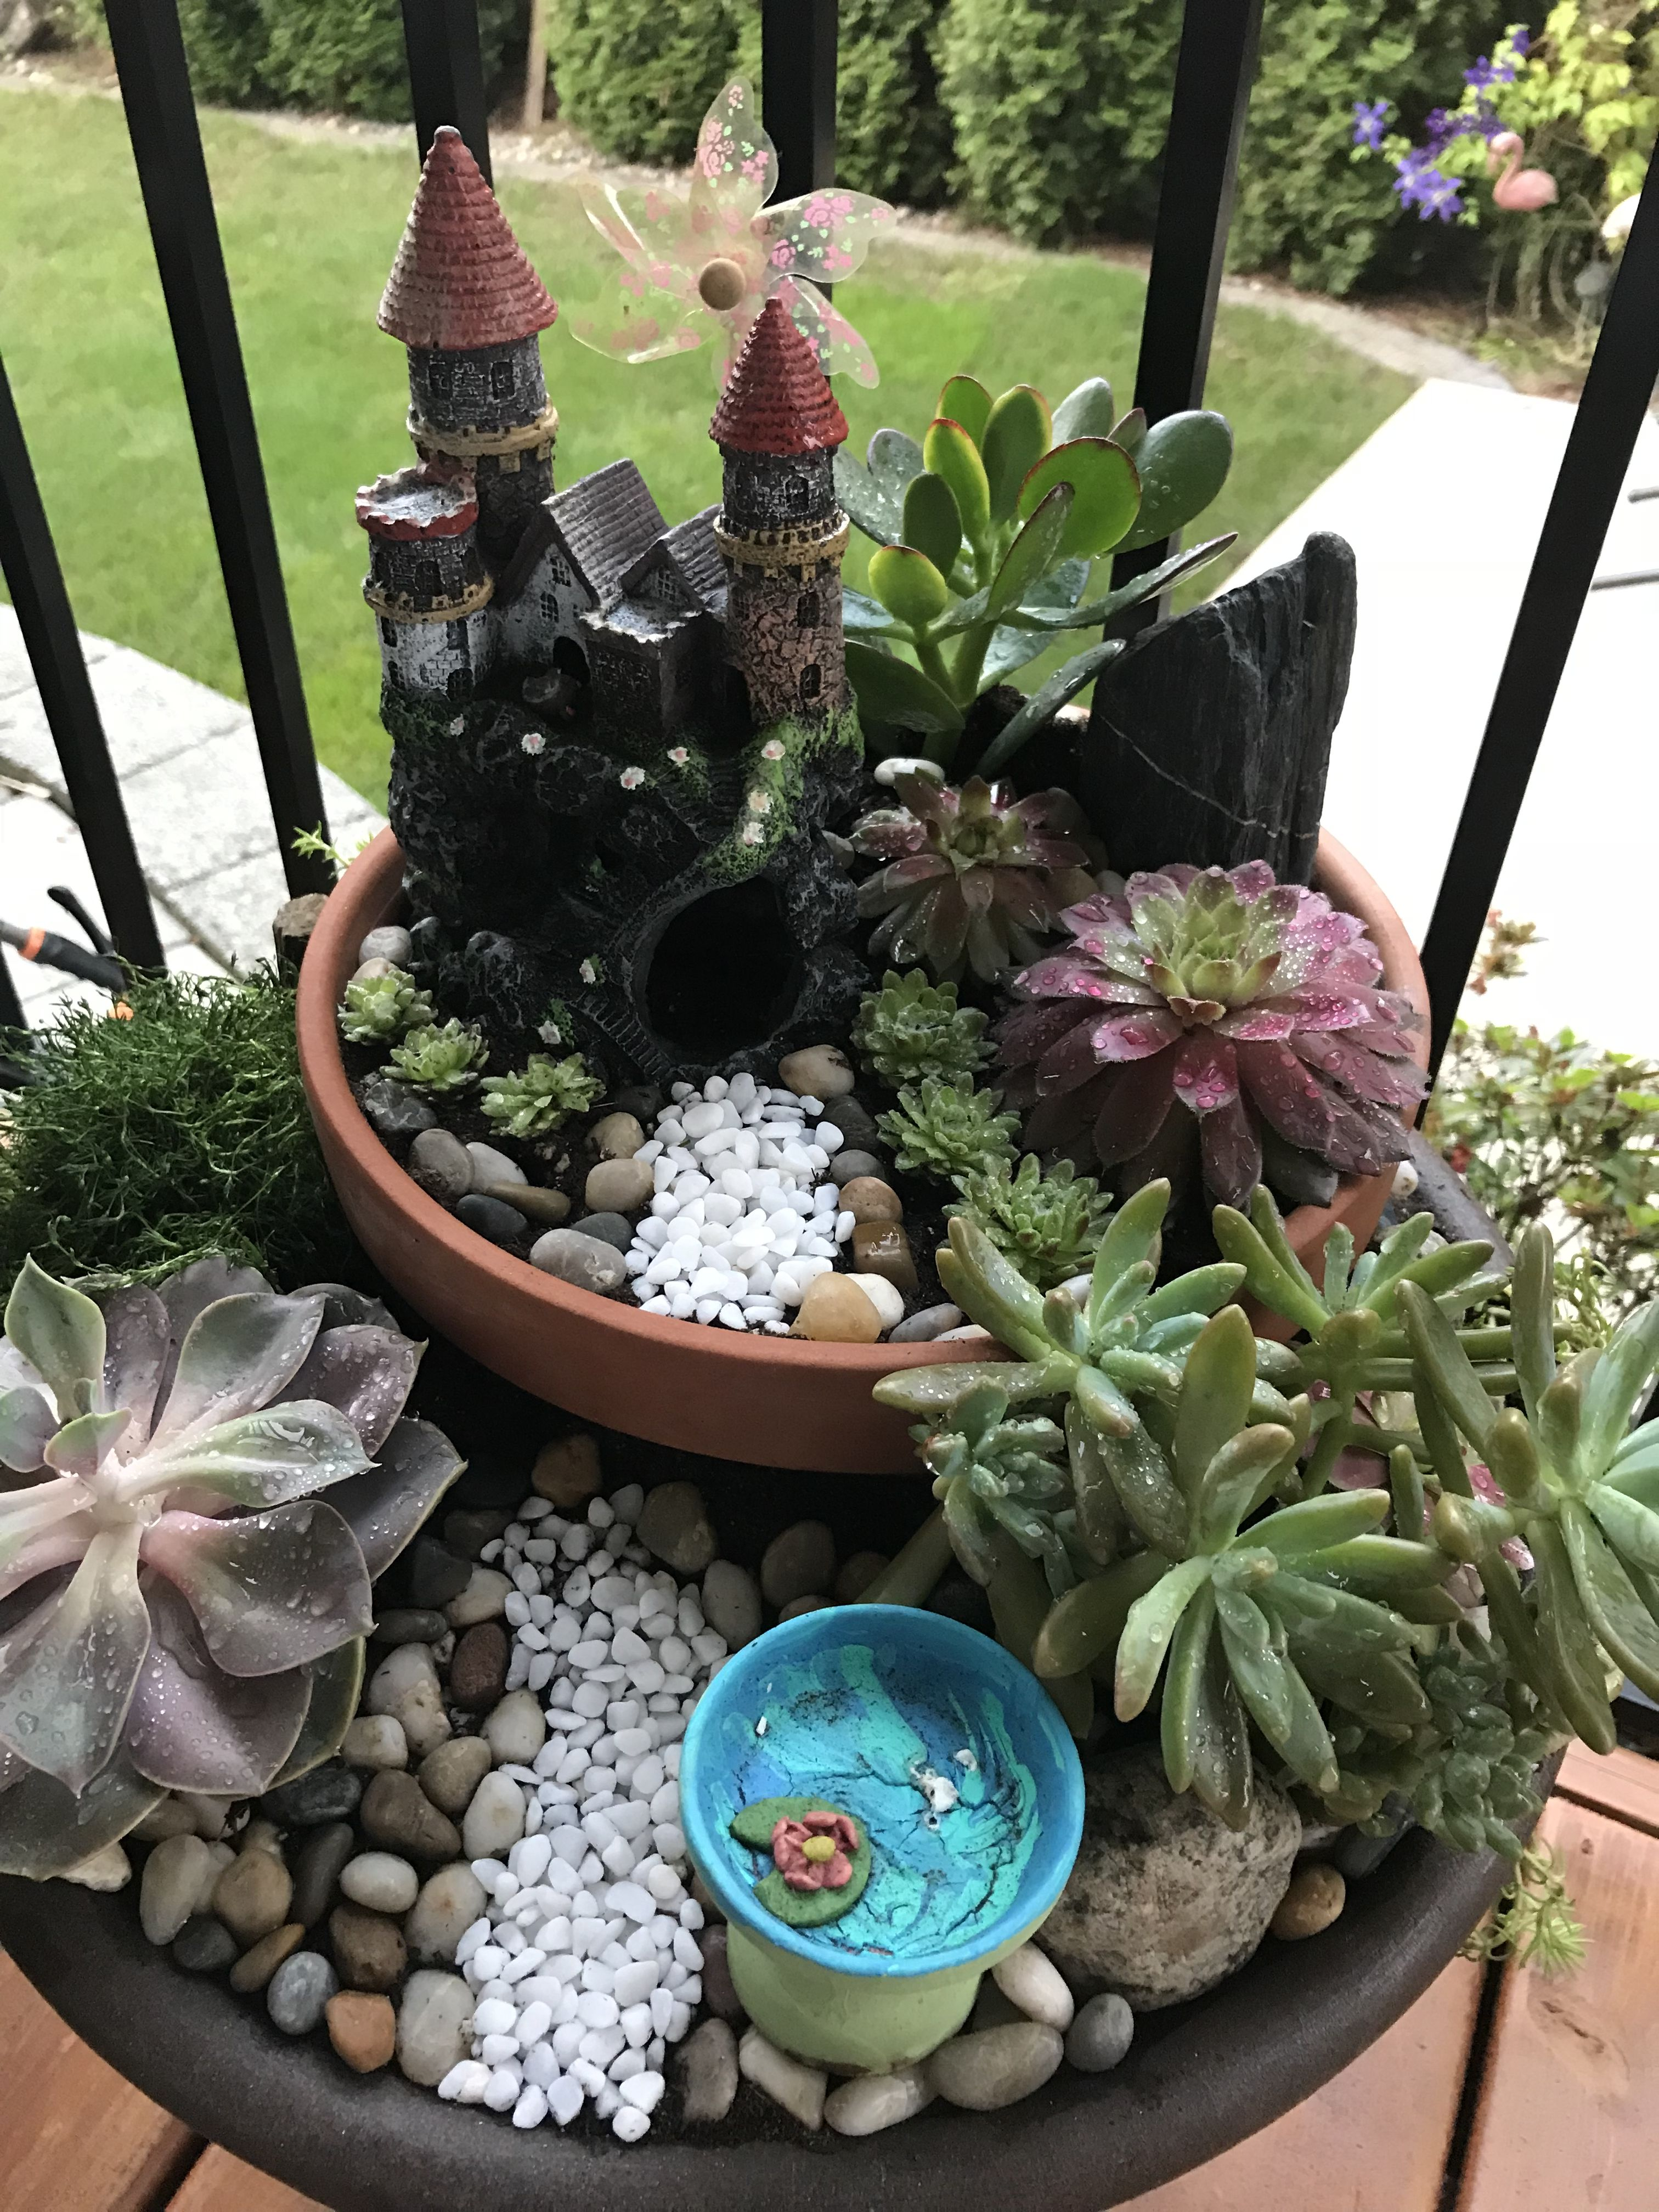 Idee Per Vasi Da Fiori pin di tomaso carta su giardino | giardino